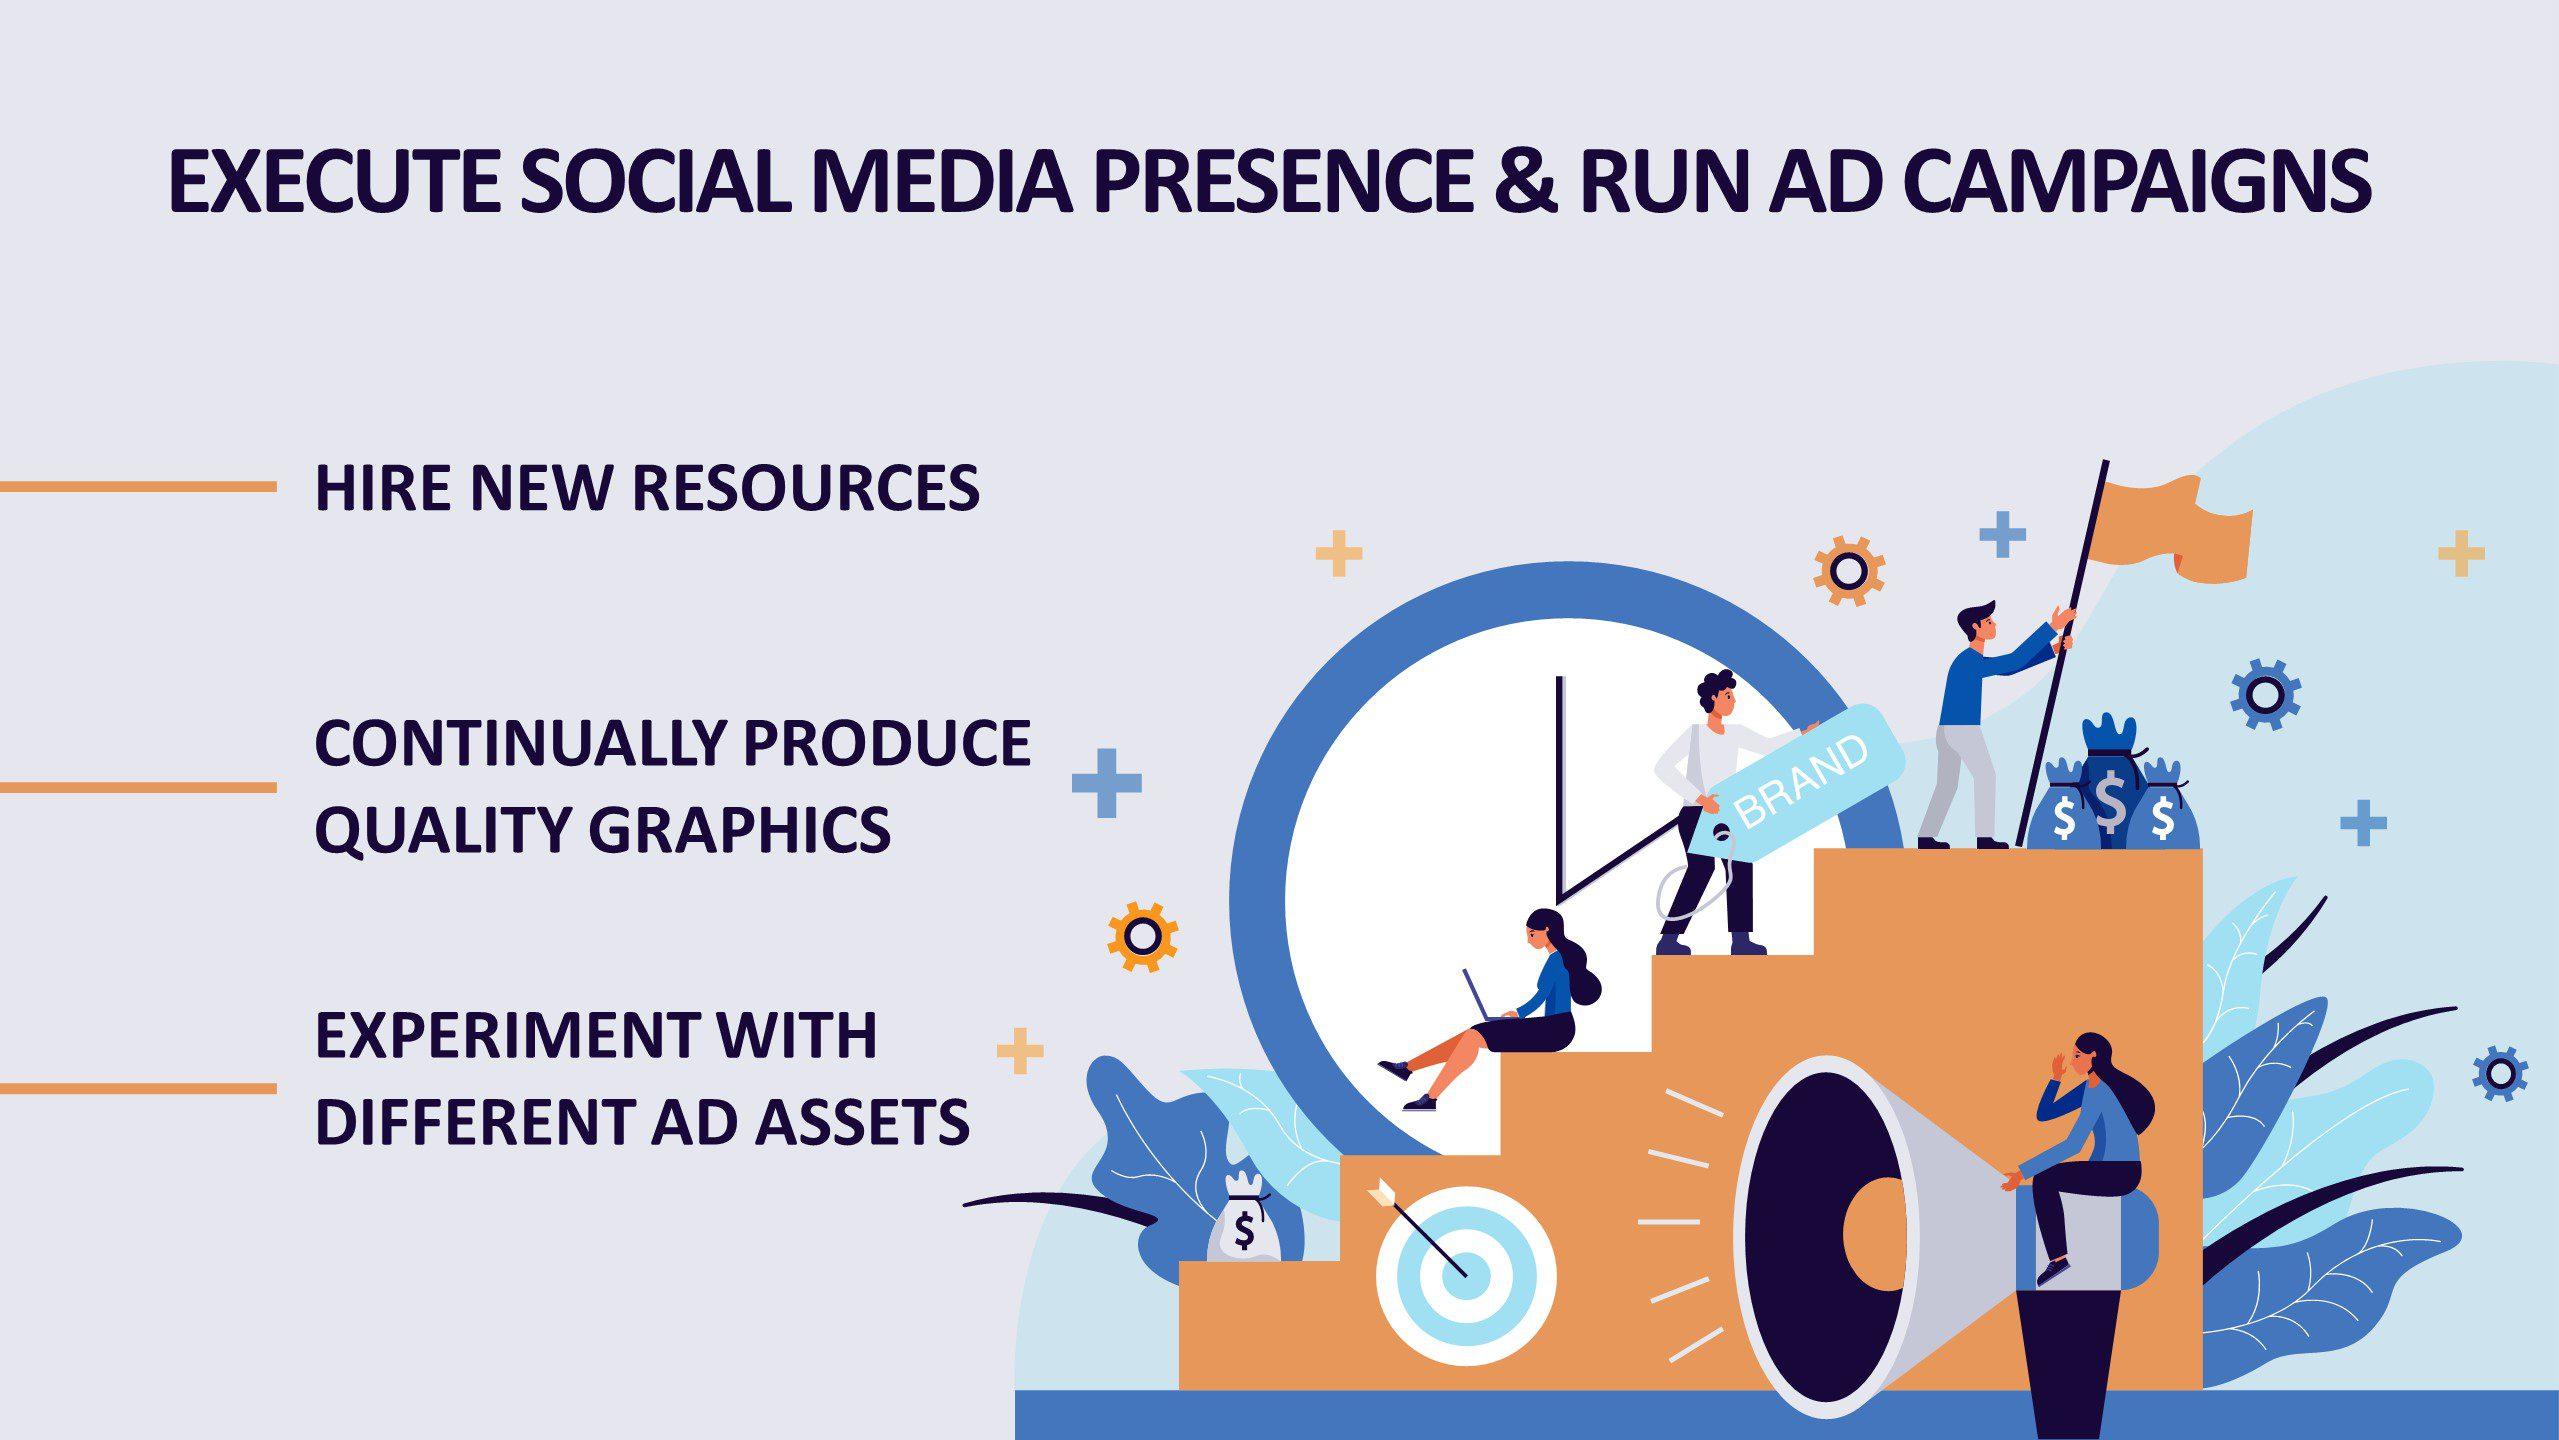 EXECUTE SOCIAL MEDIA PRESENCE & RUN AD CAMPAIGNS